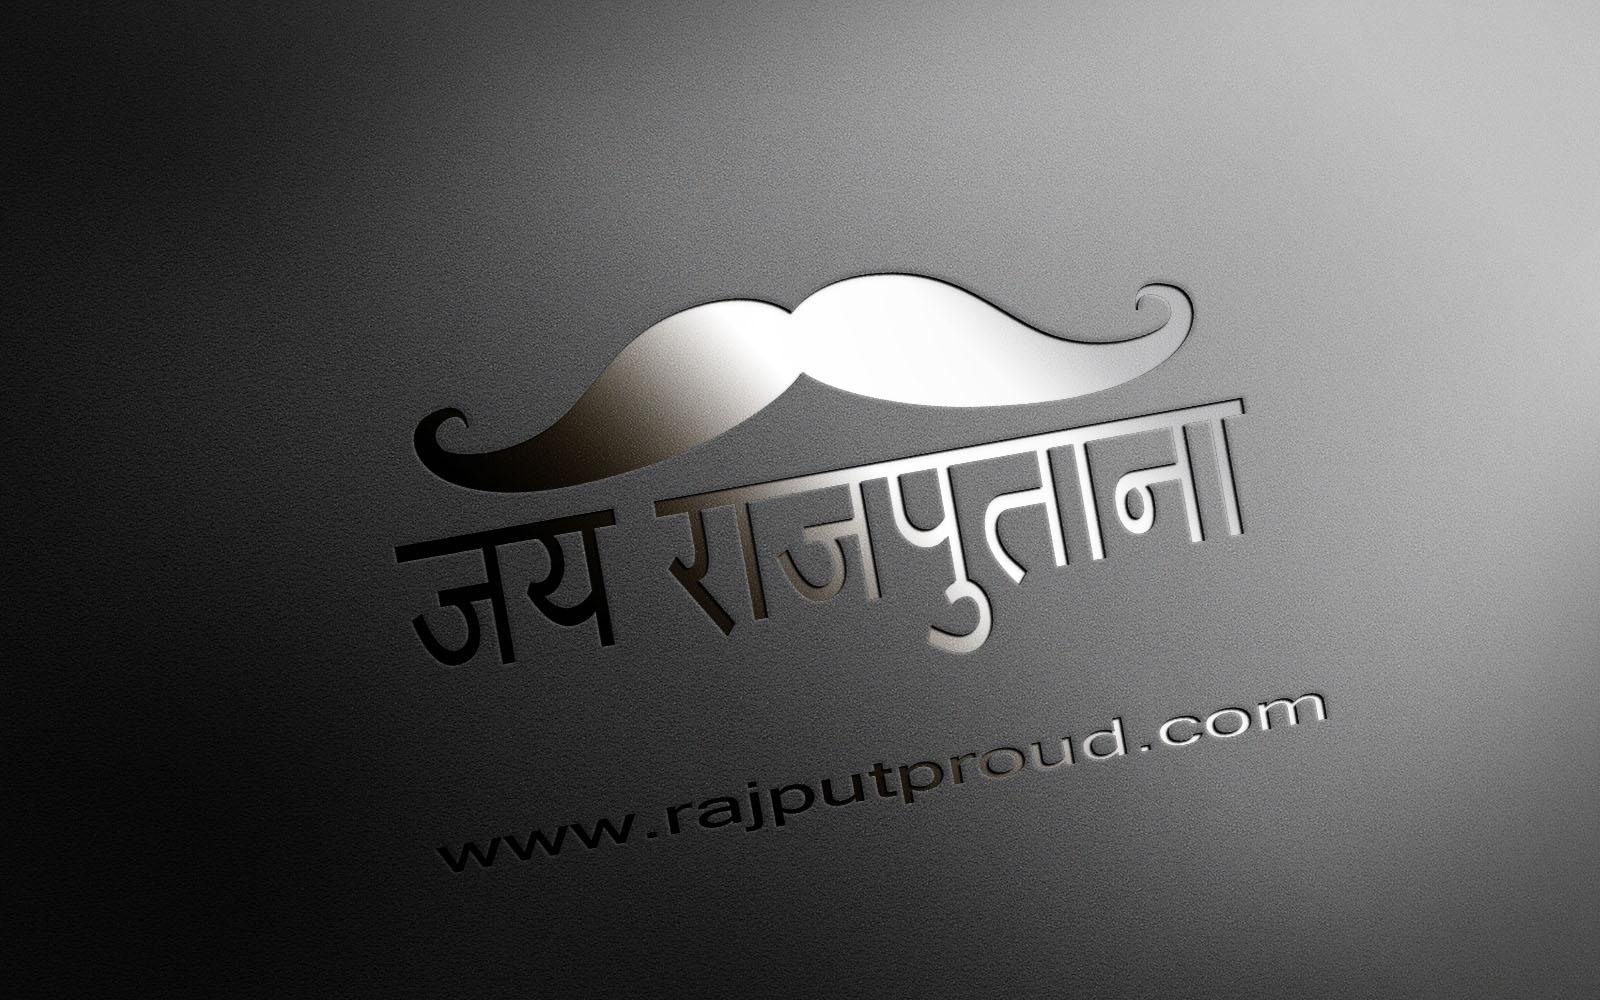 Rajput Royal Attitude status